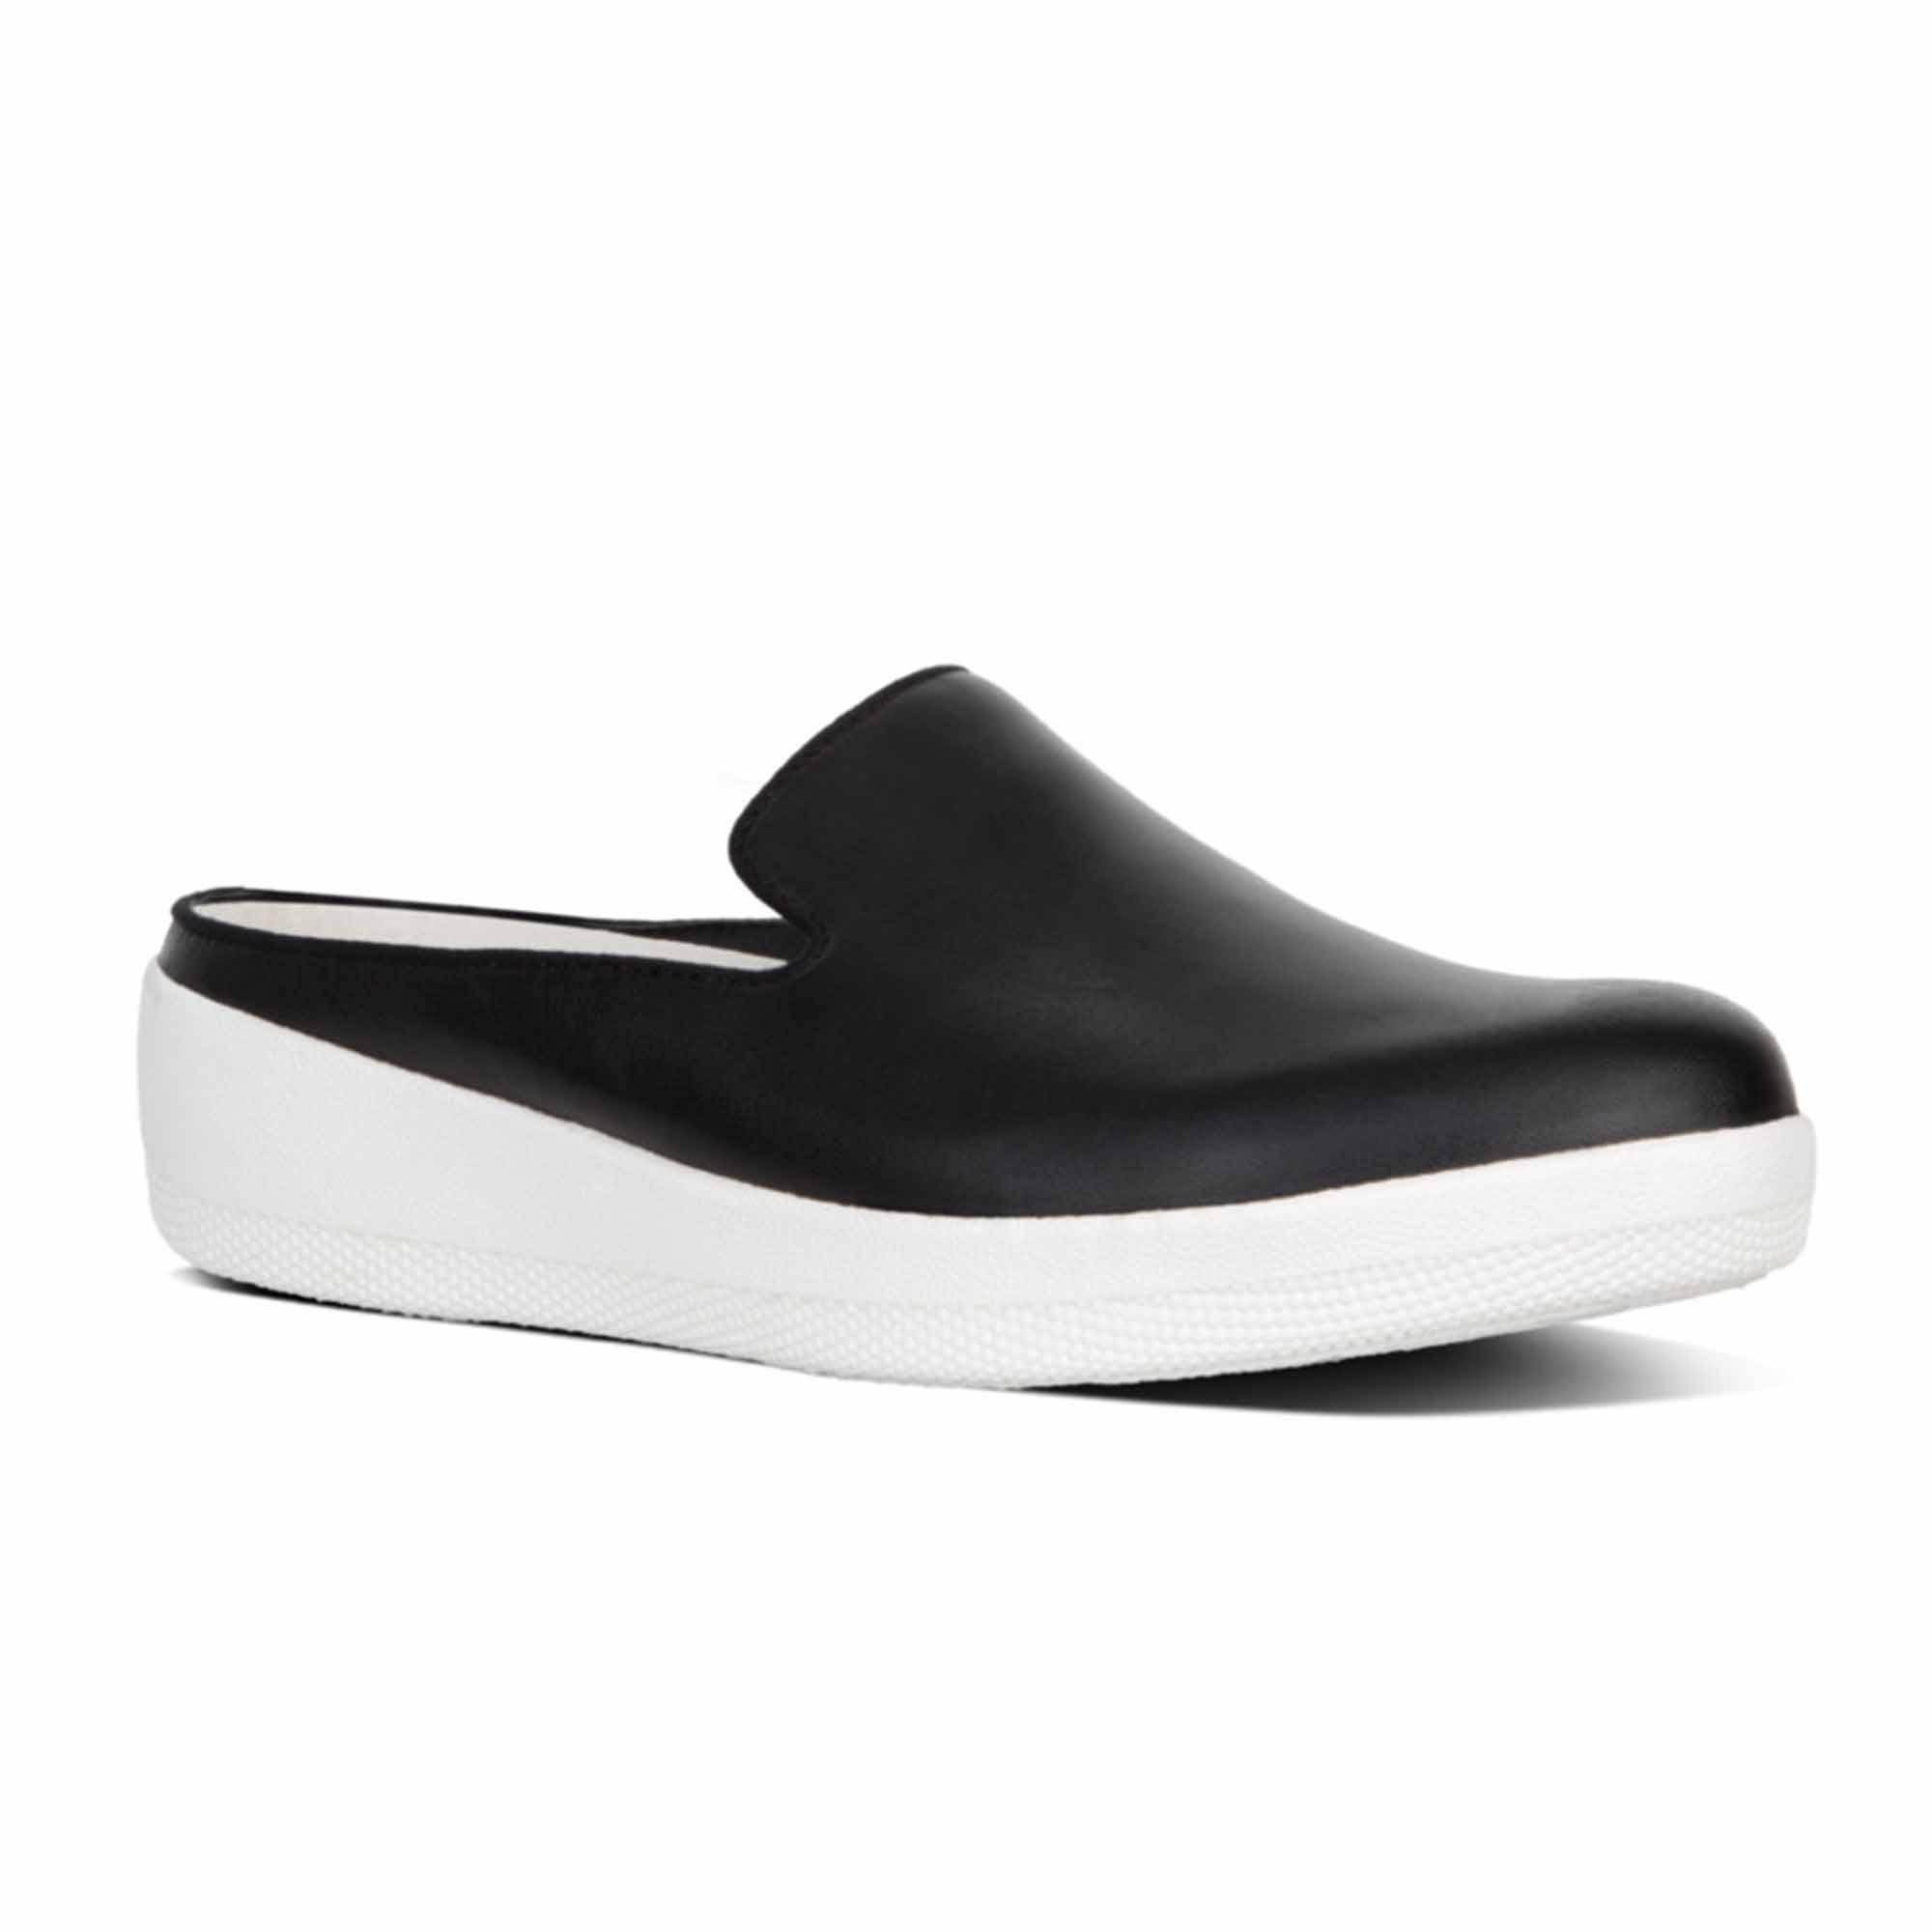 Ladies Real Leather Slip On Mule Black